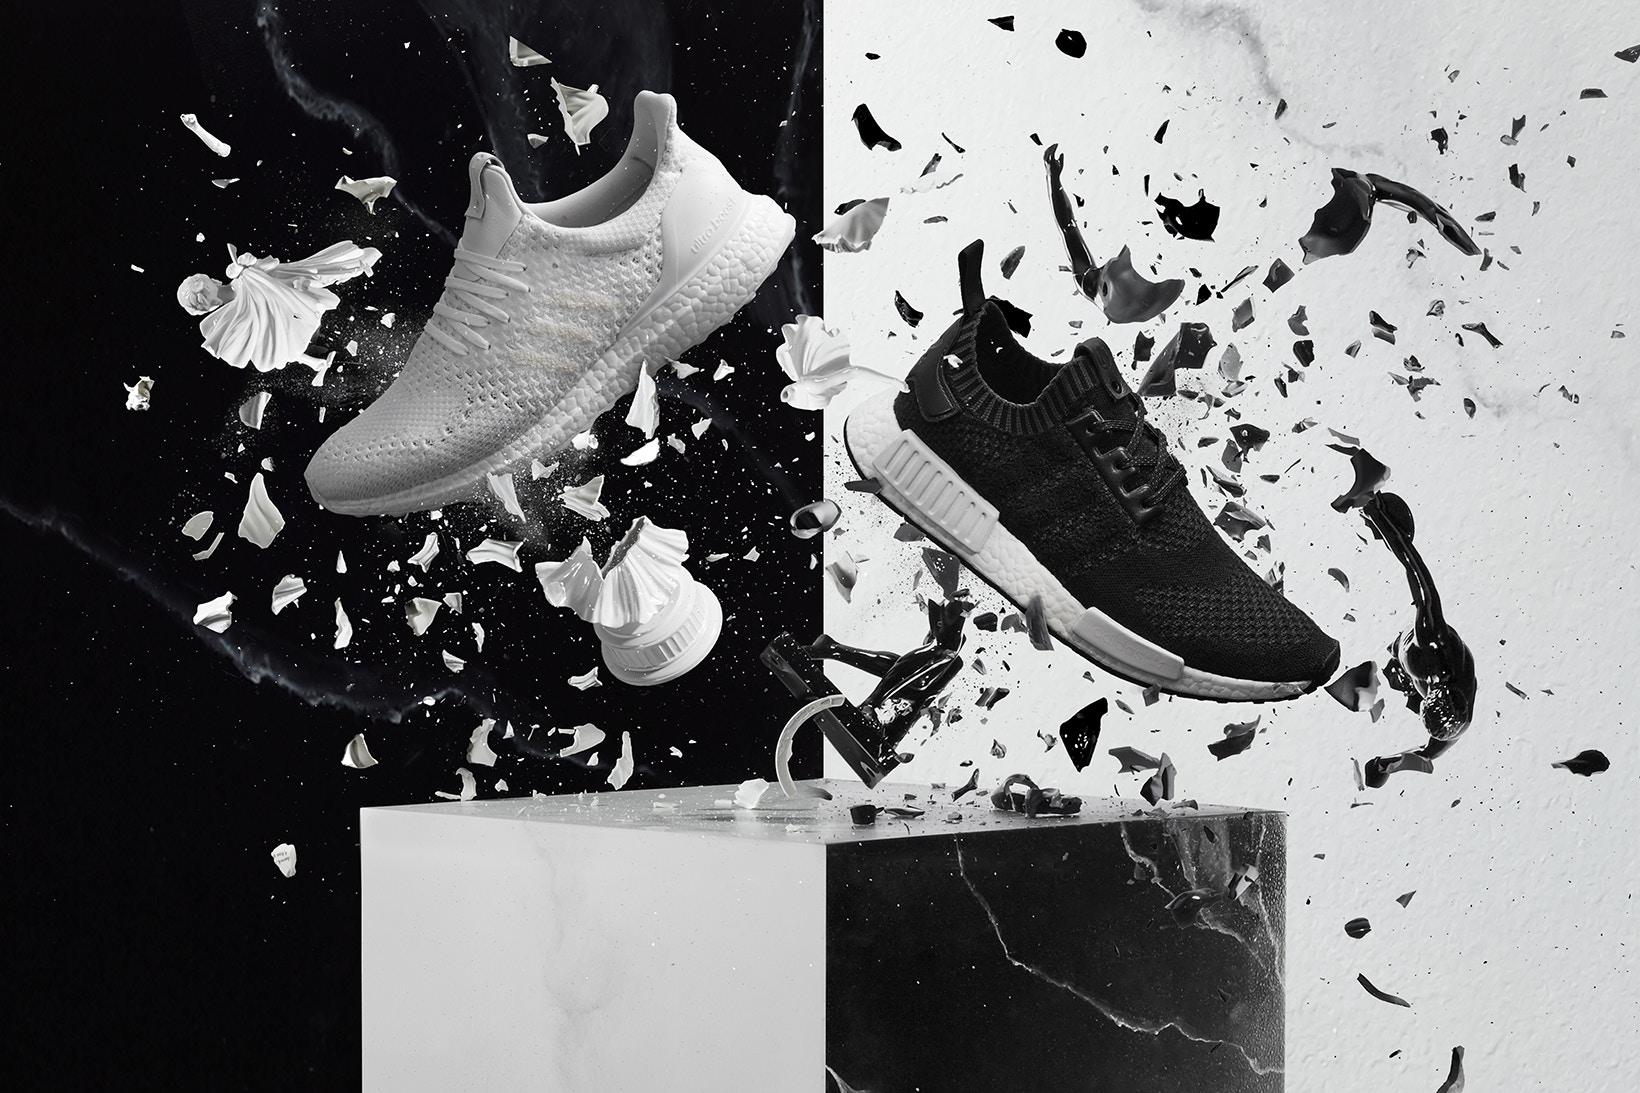 adidas-consortium-sneaker-exchange-invincible-a-ma-maniere-1.jpg